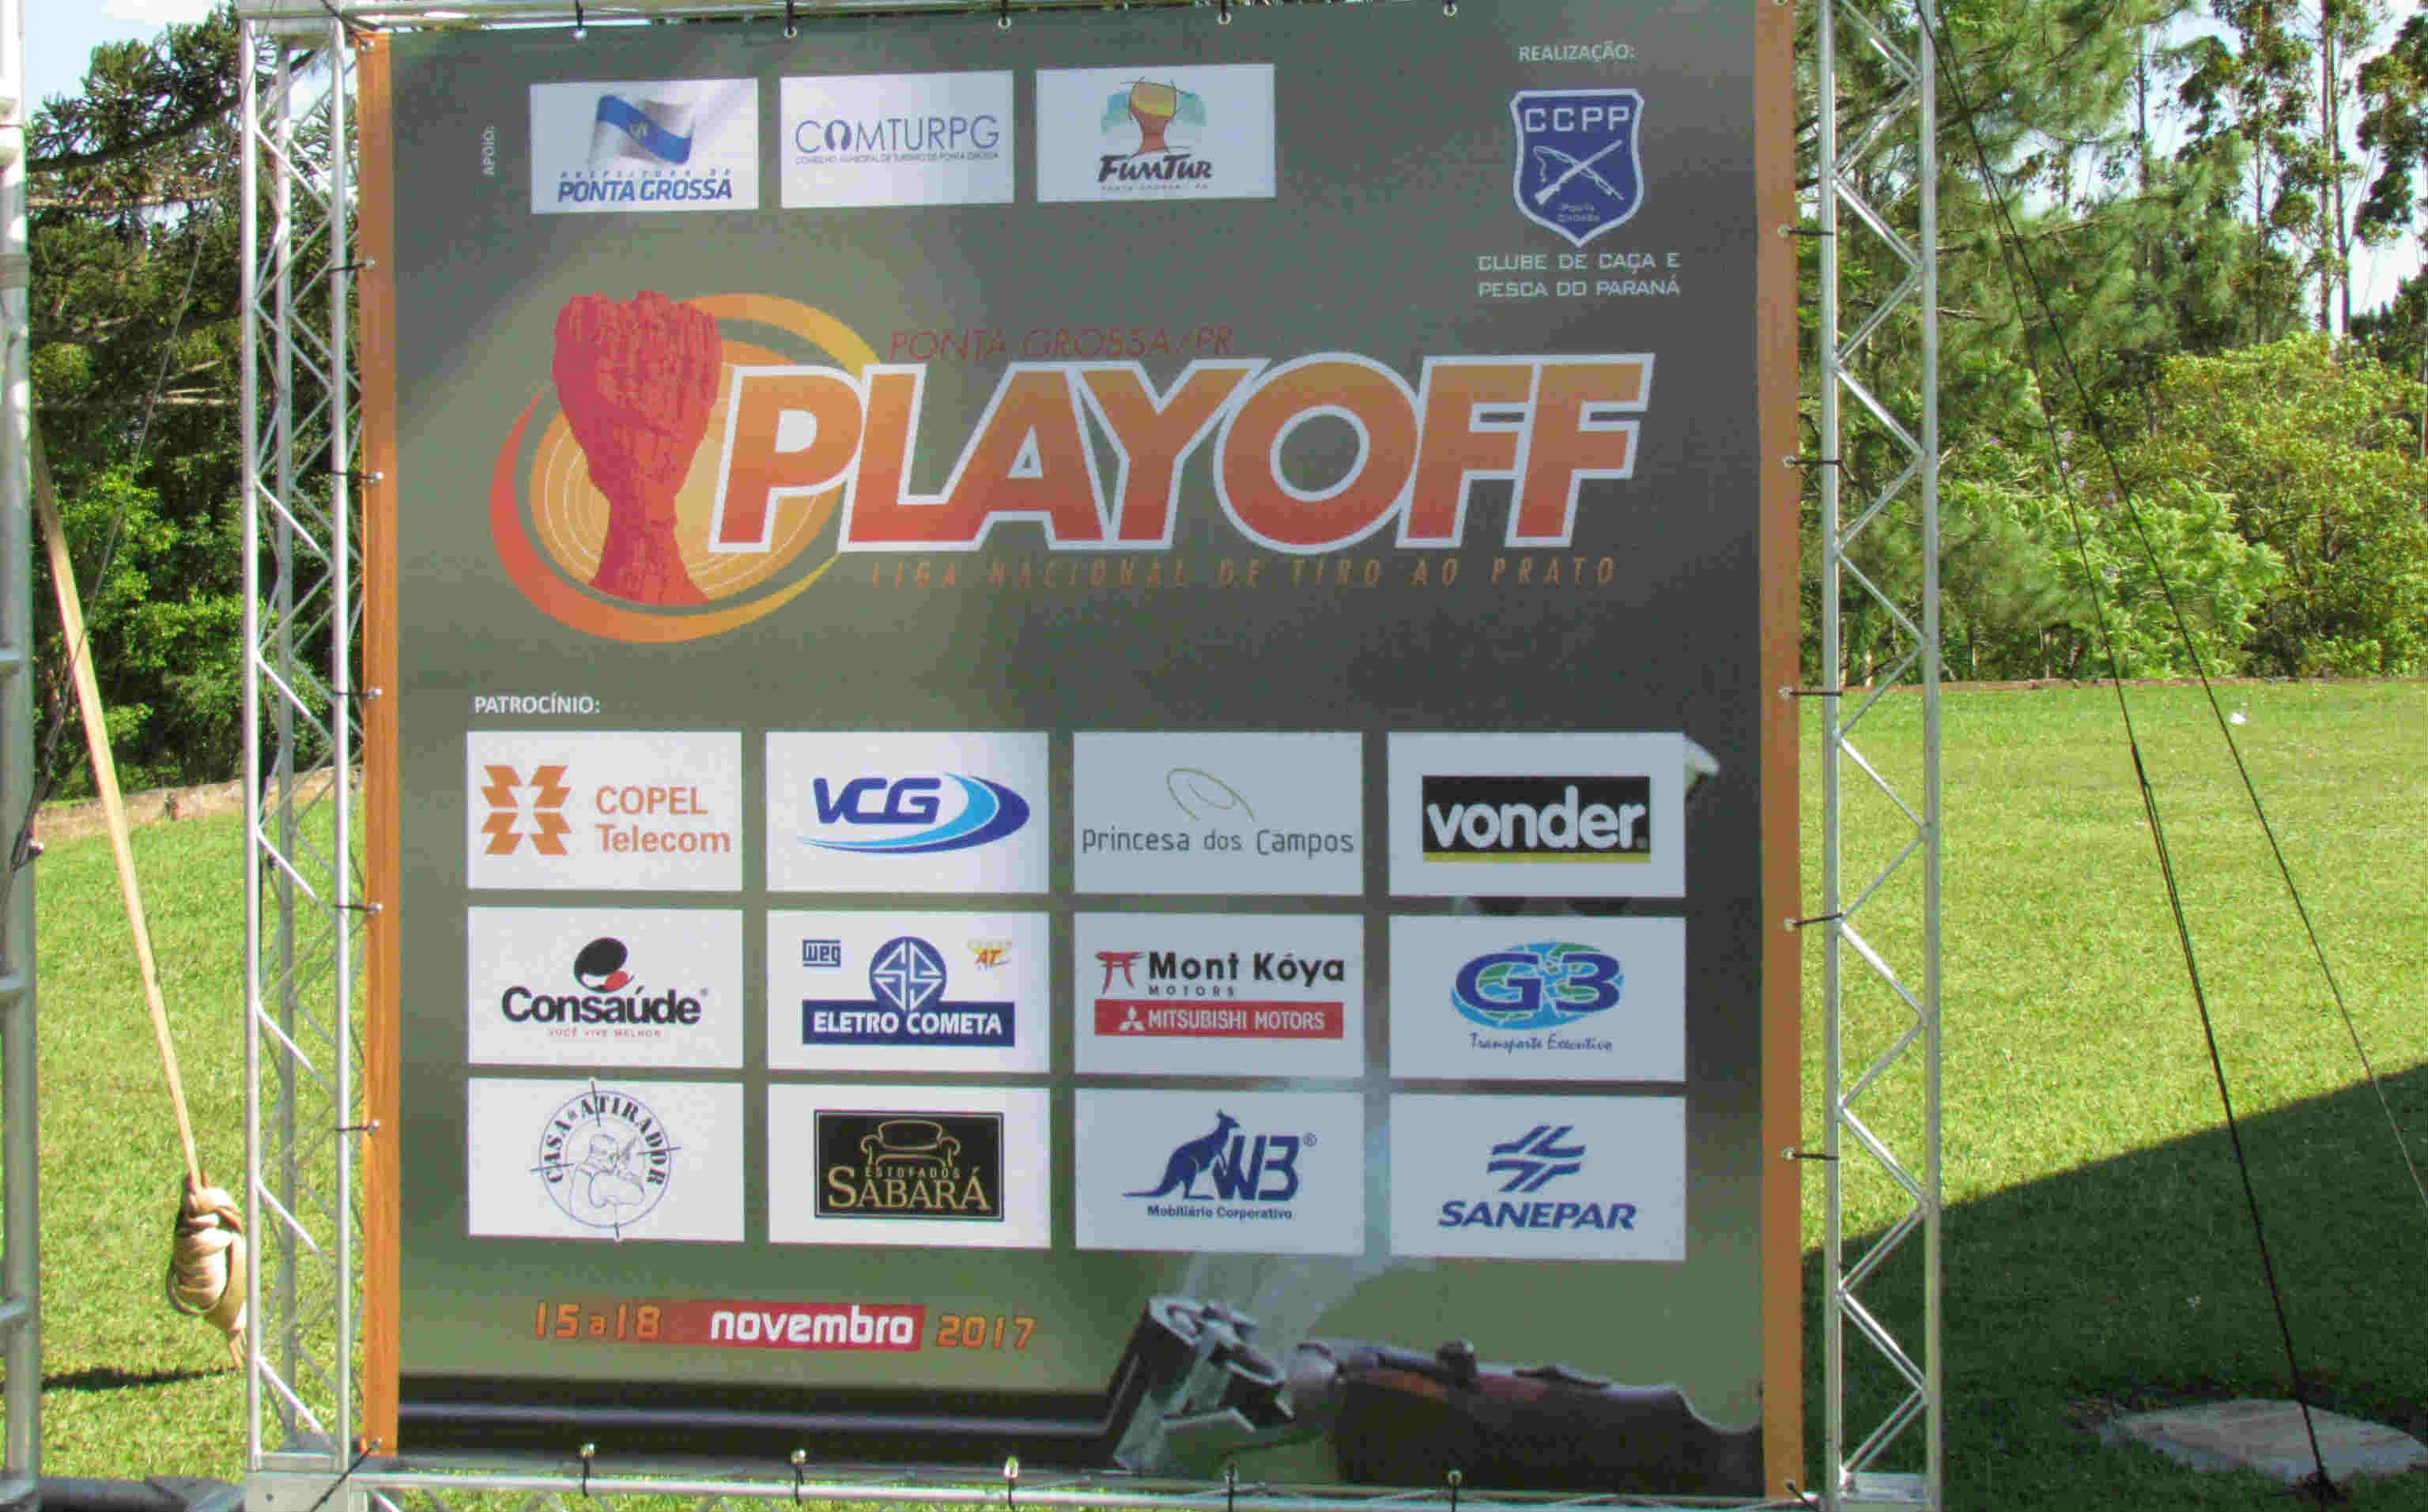 Playoff da Liga Nacional de Trap Americano - Tiro esportivo